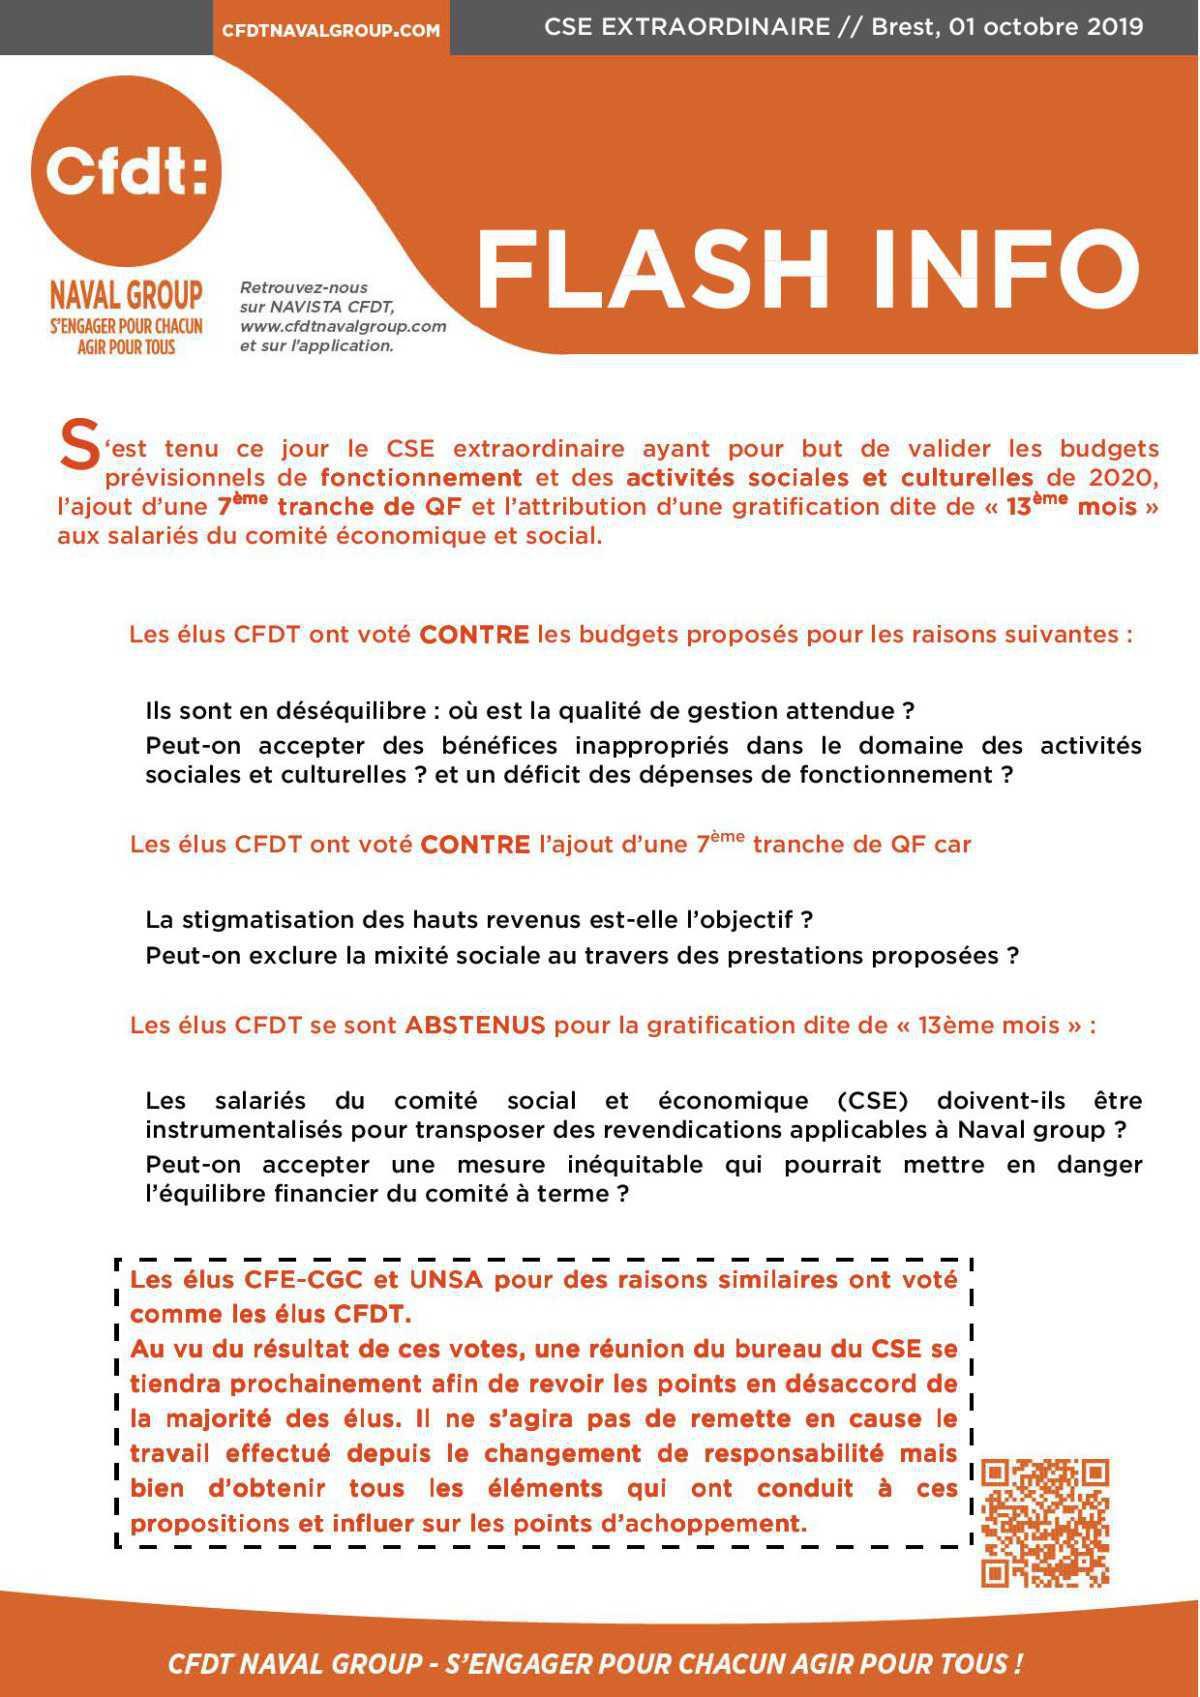 FLASH INFO CSE EXRAORDINAIRE